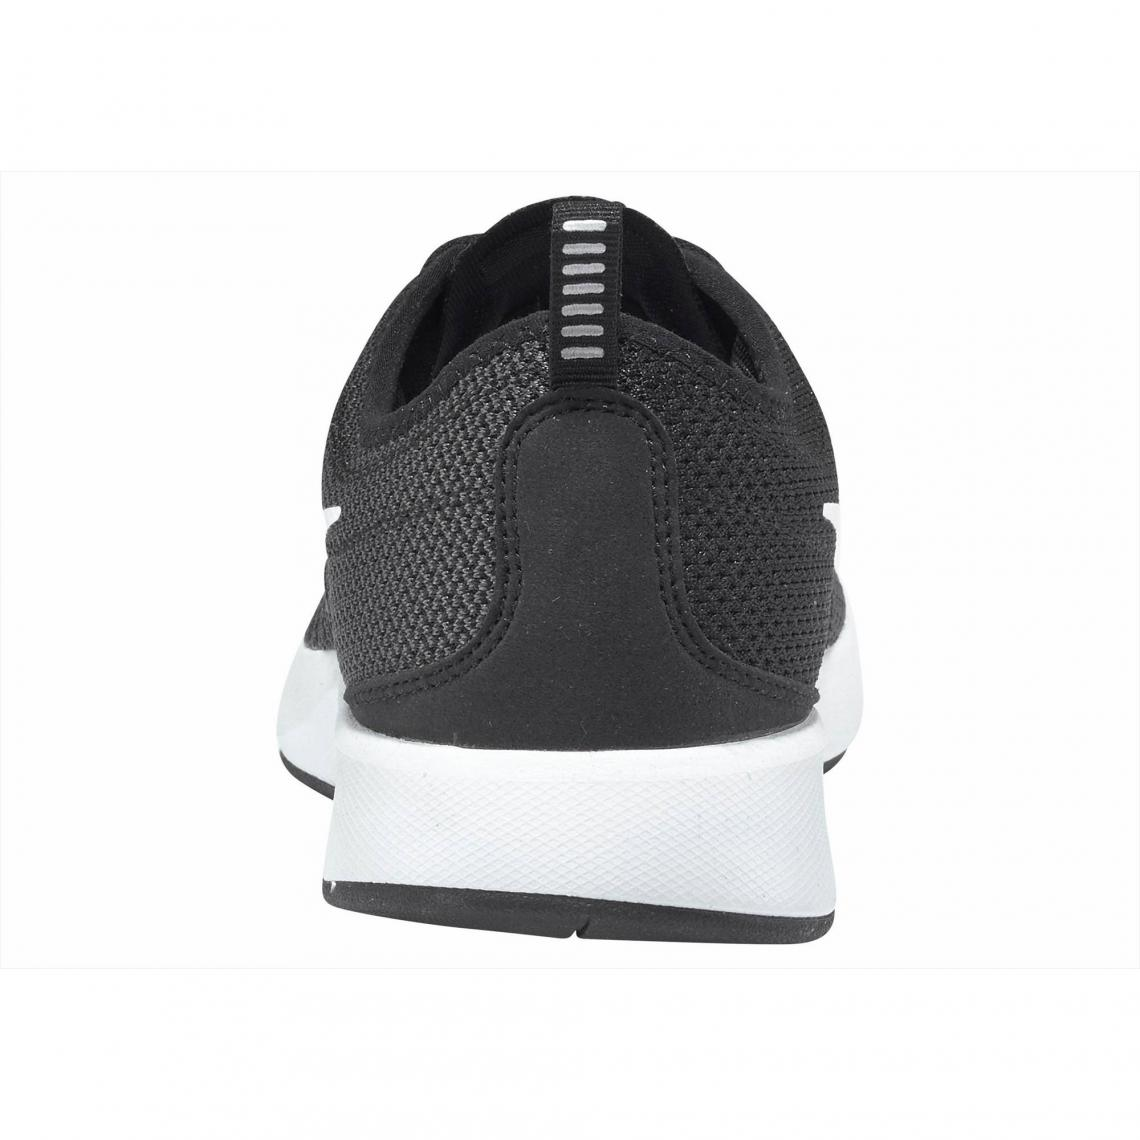 on sale f1e04 fc42a Chaussures de running femme Nike Sportswear Dualtone Racer - Noir - Gris  Anthracite Nike